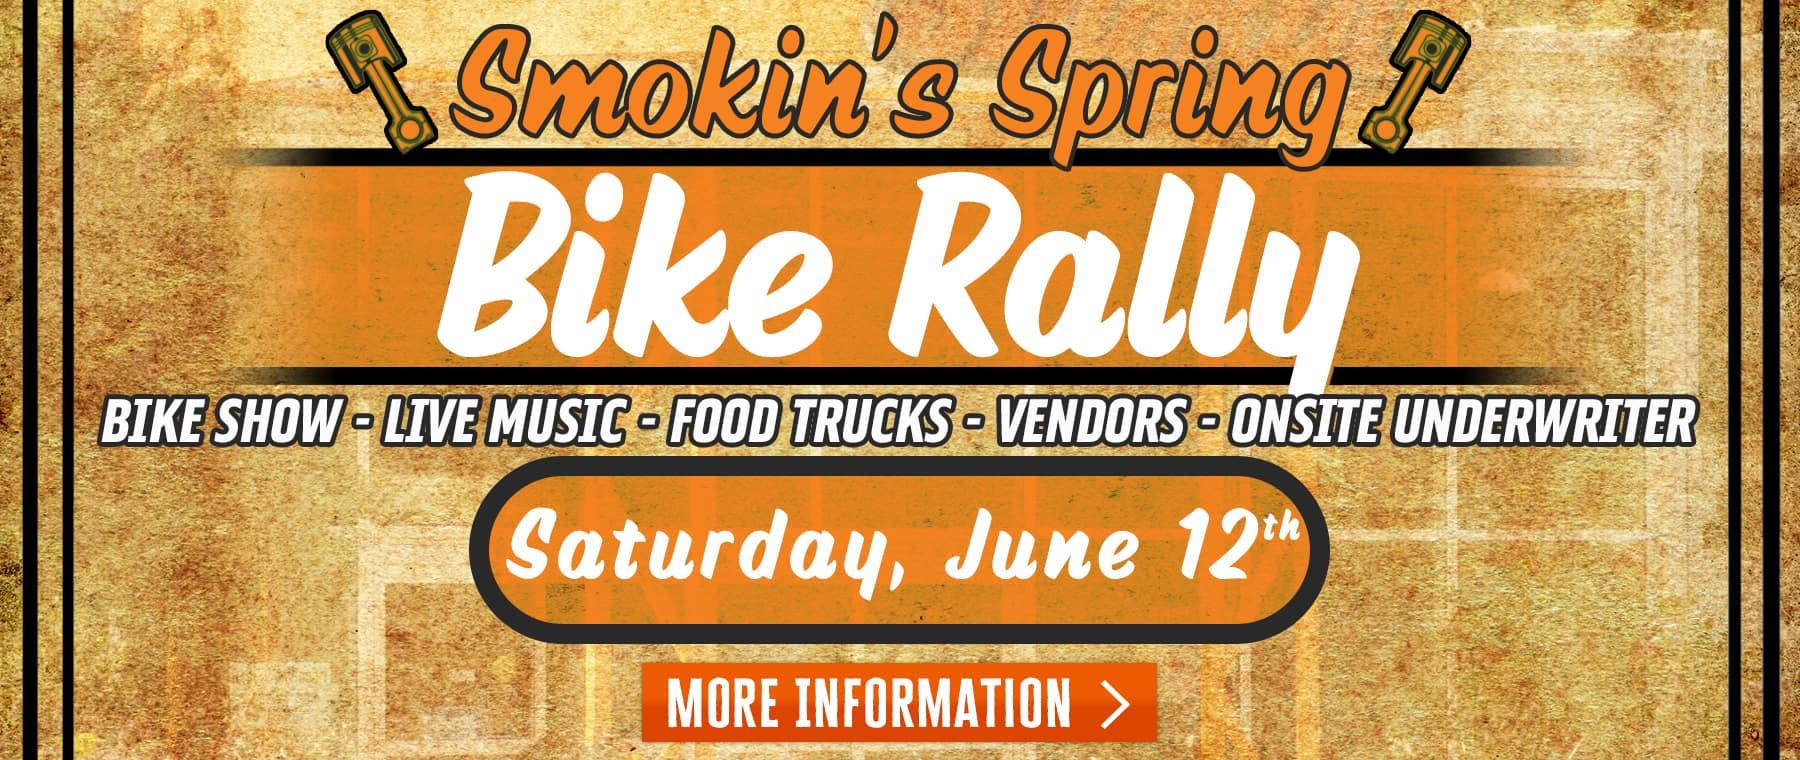 Smokin' Spring Bike Rally – Web Banner